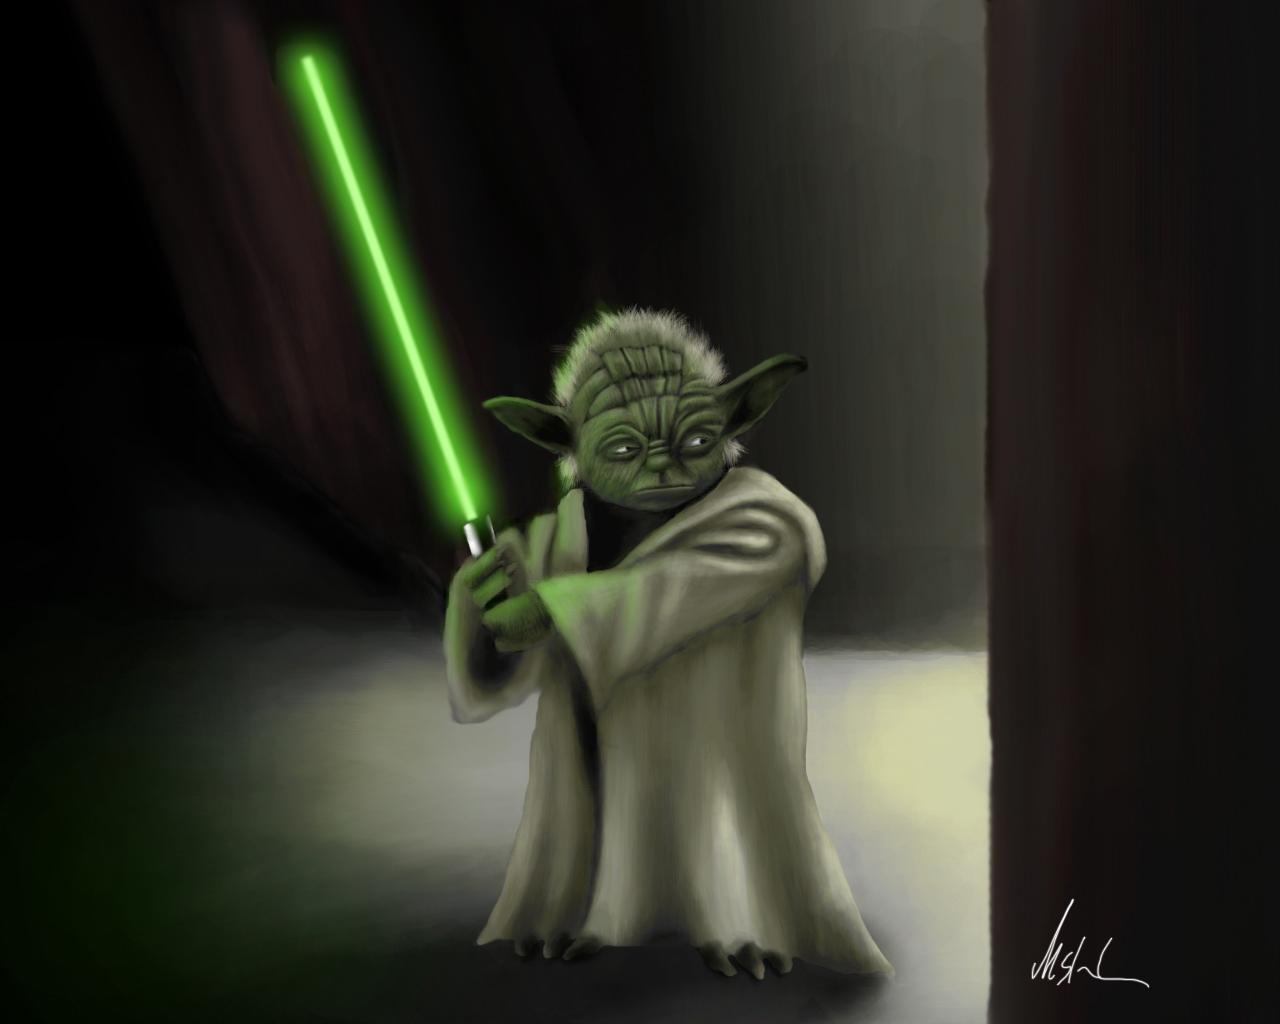 https://fc01.deviantart.com/fs24/f/2008/028/c/2/Yoda_by_DiBBiEZ.jpg